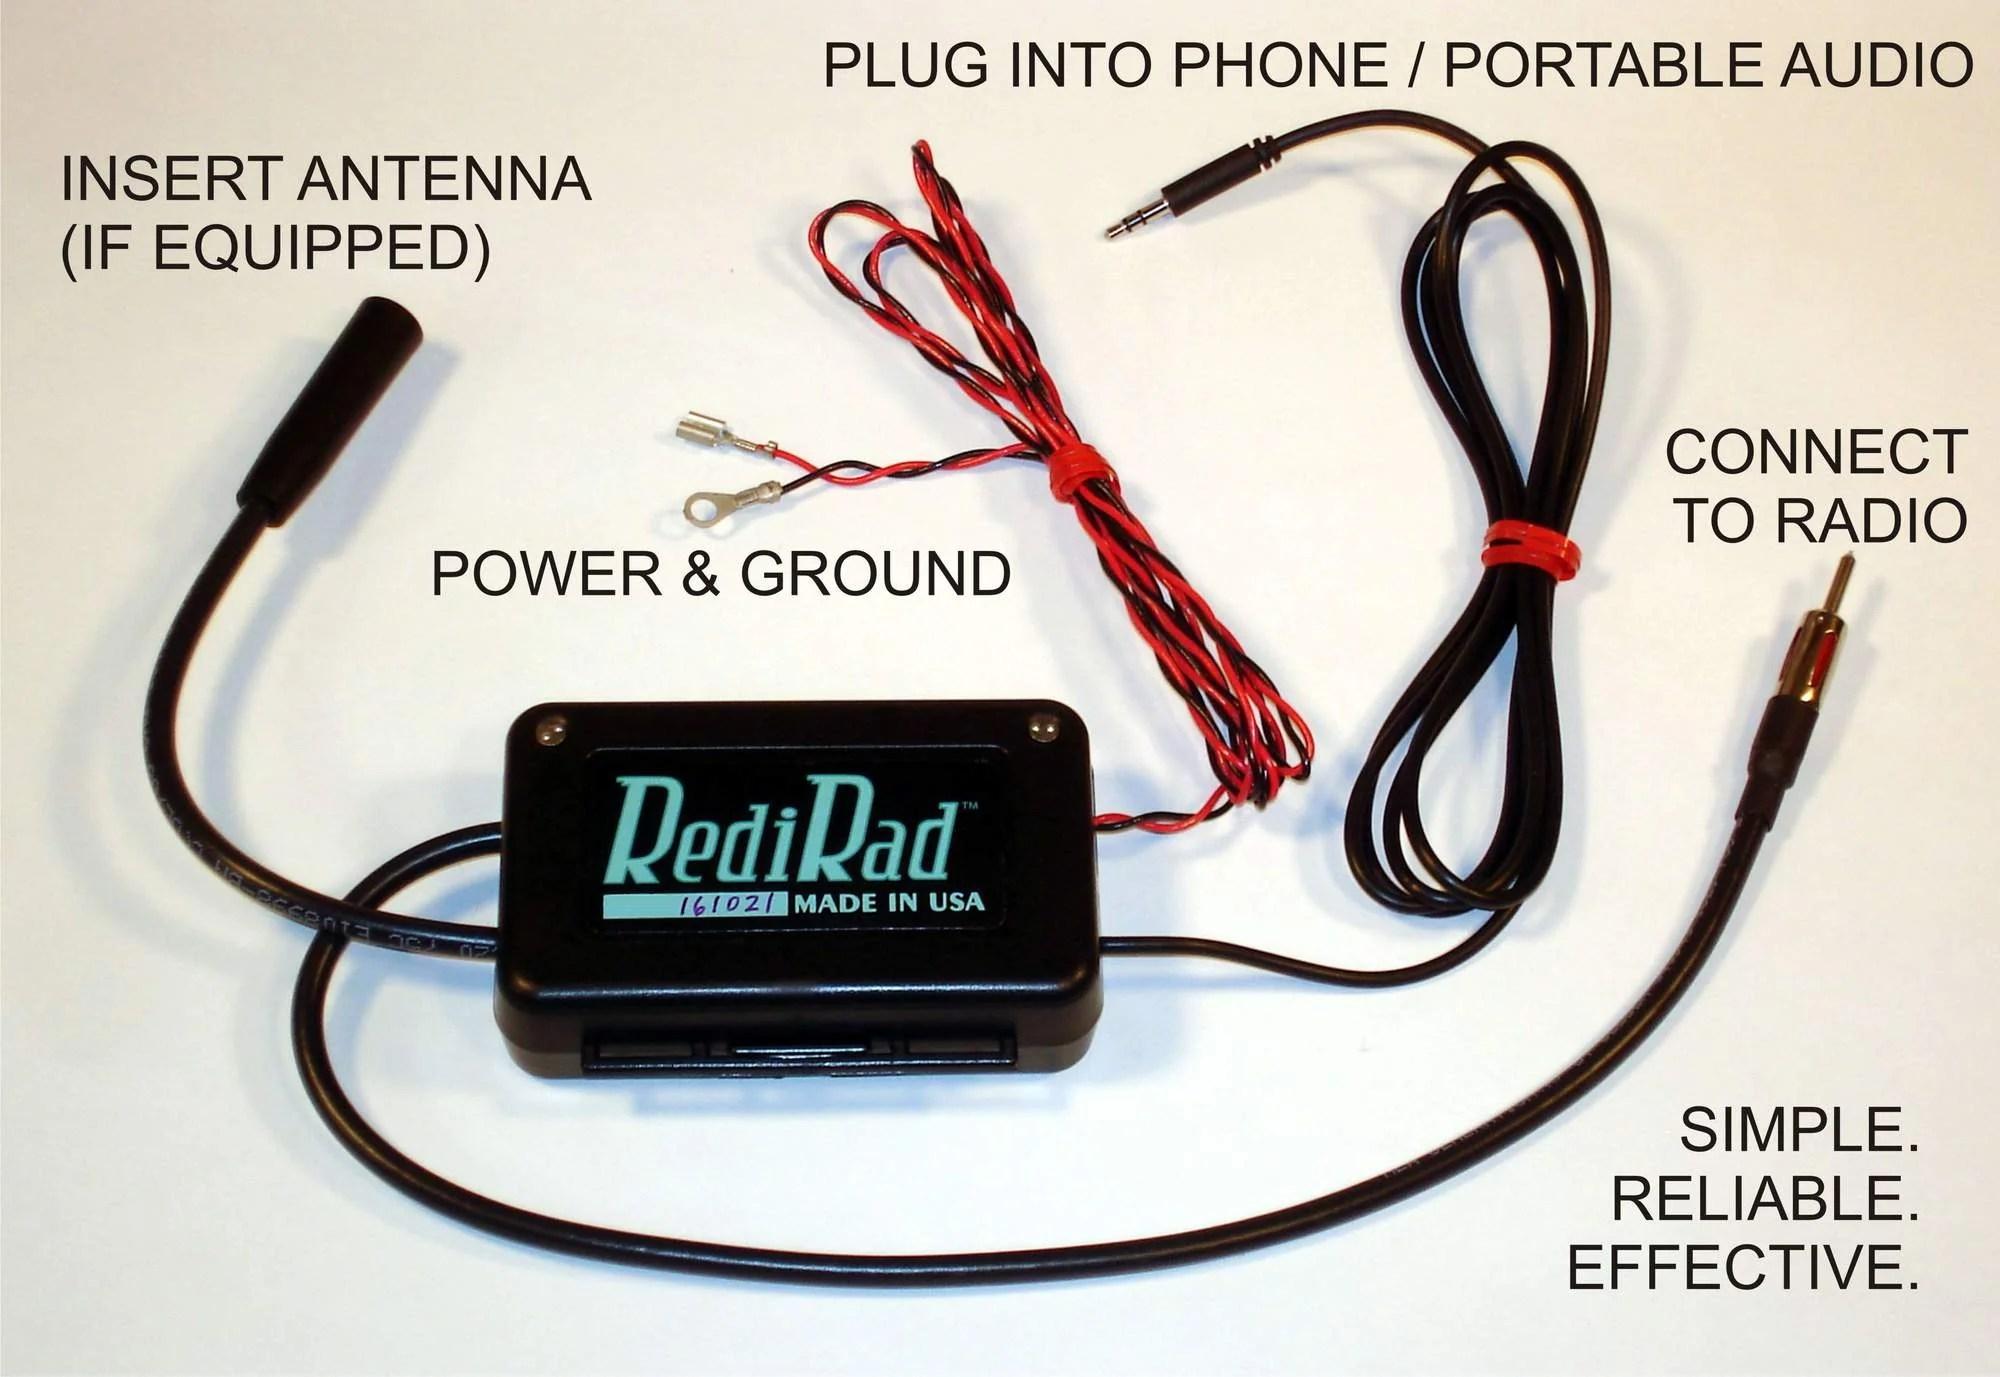 redirad rr am n antenna bypass am modulator aux input classic car radio negative [ 2000 x 1377 Pixel ]